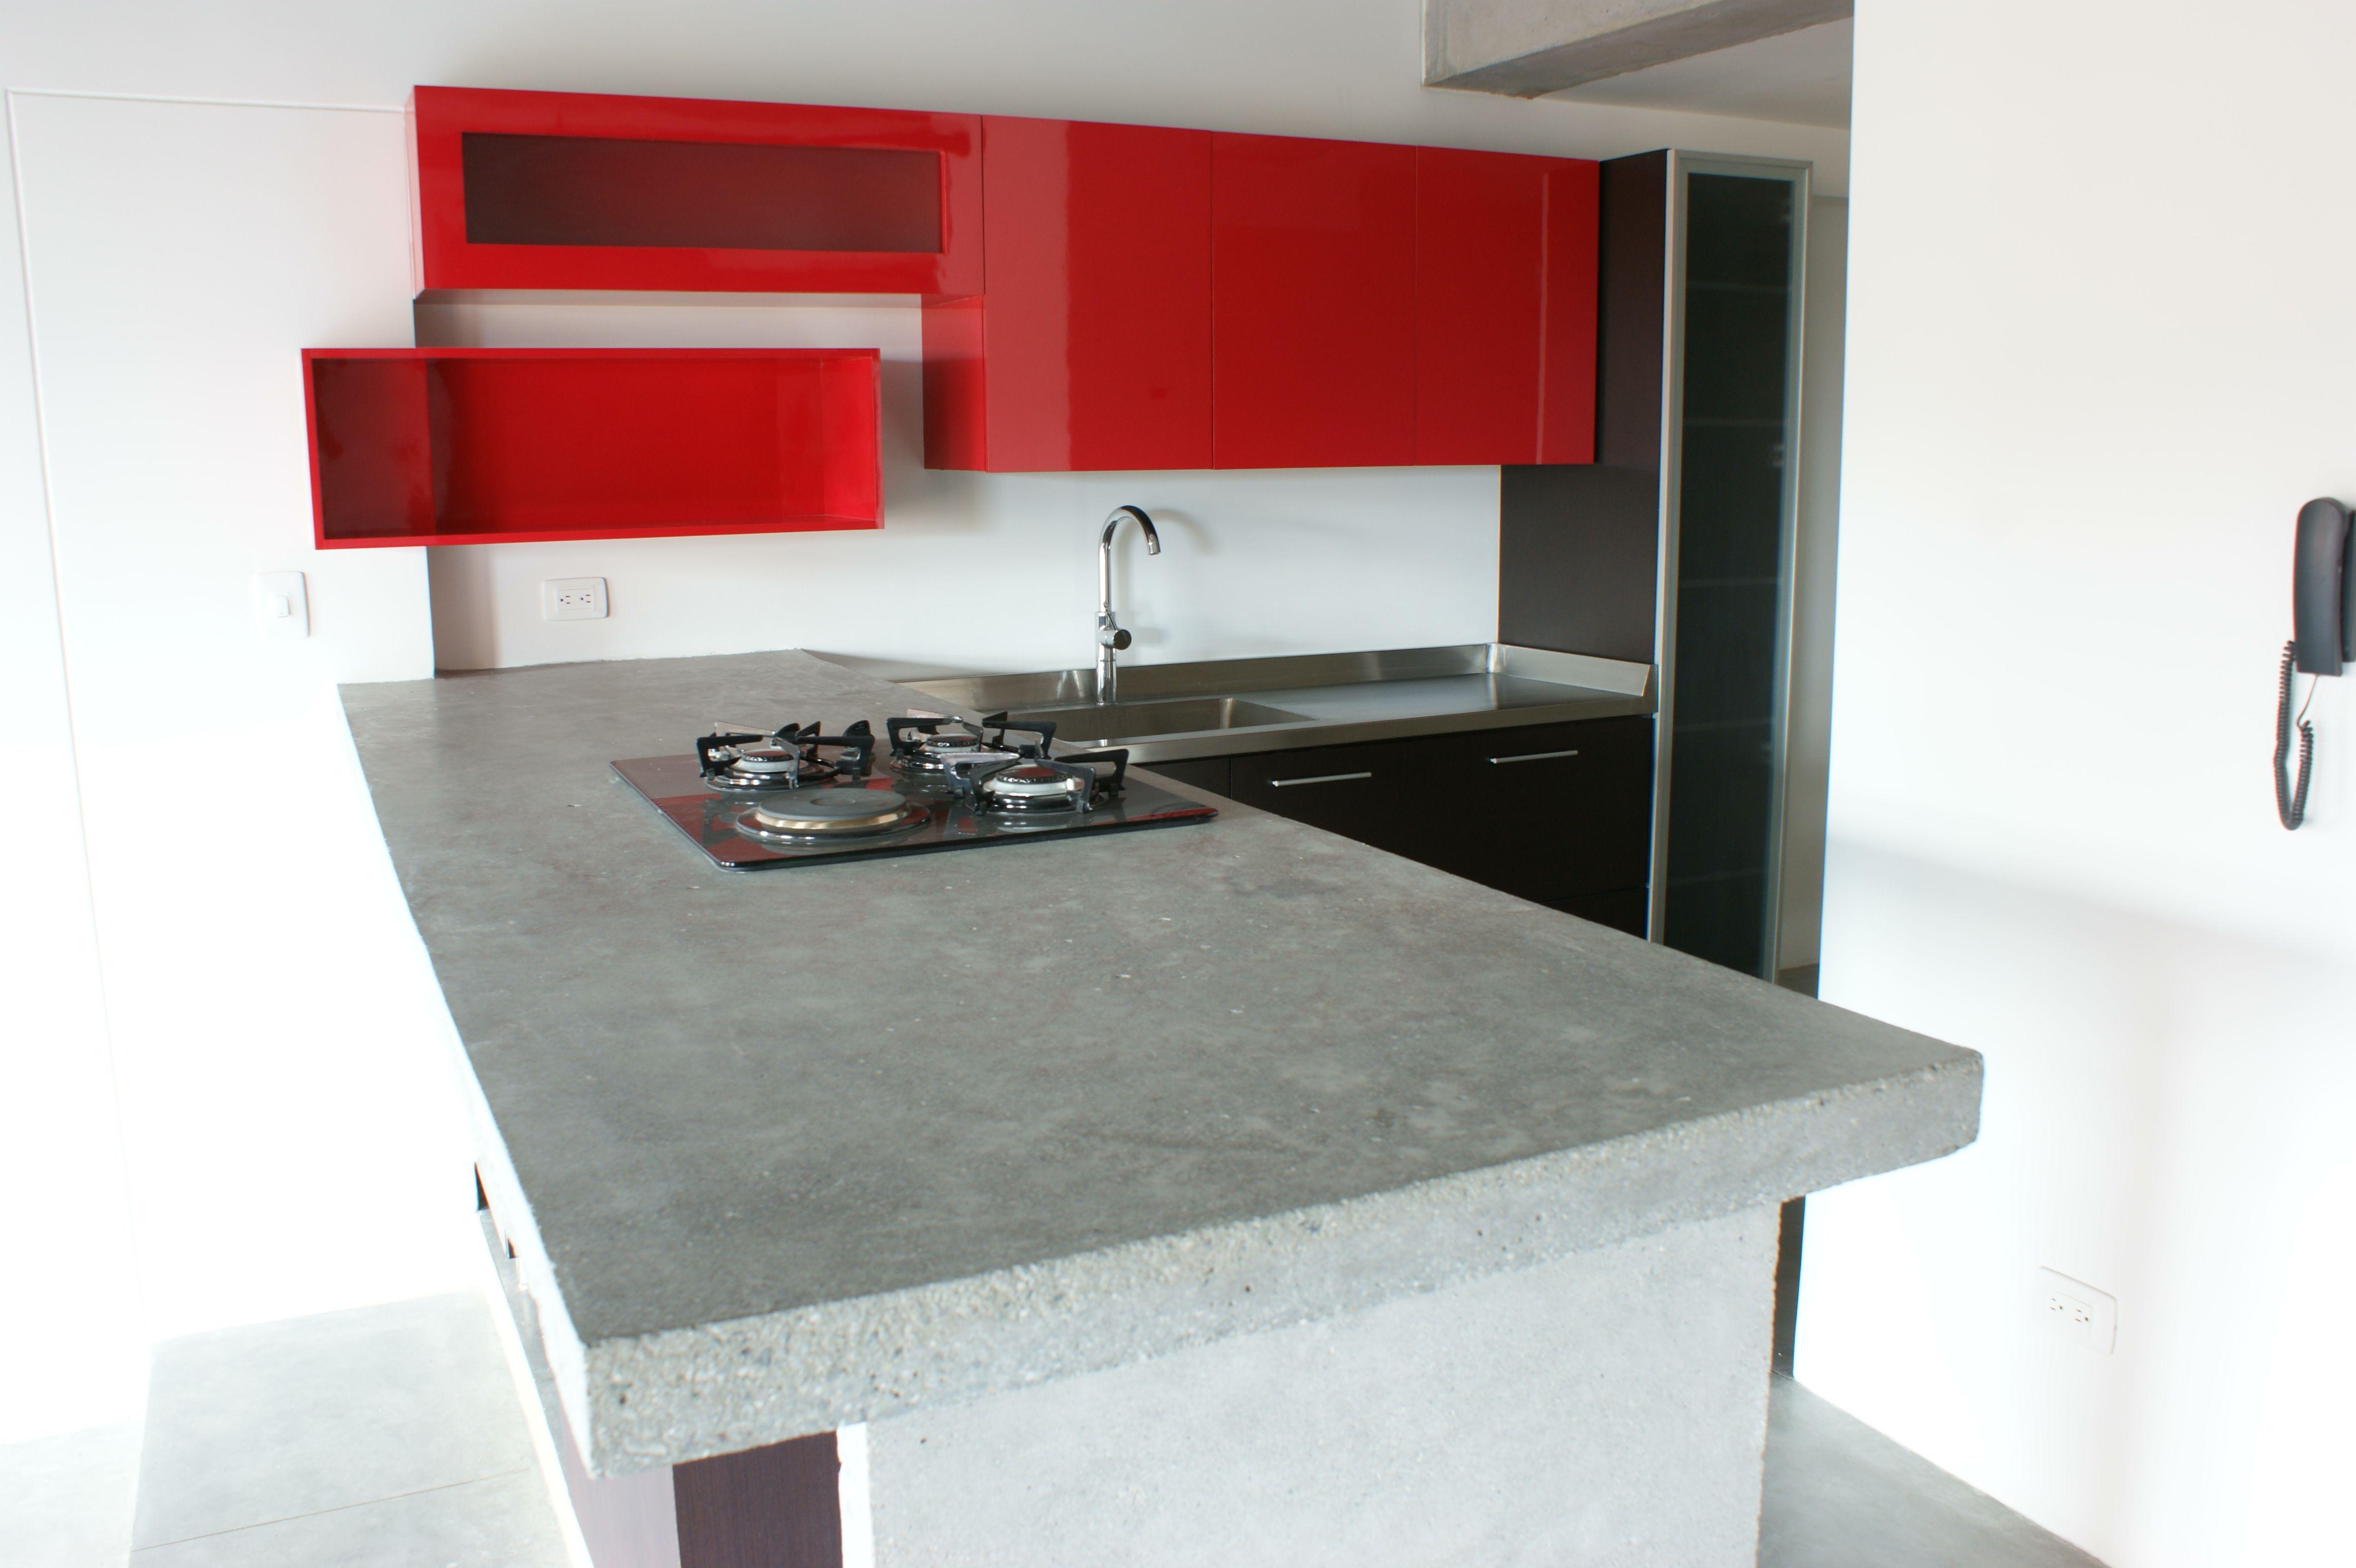 Cocina roja calle 5a mes n en concreto para la barra - Barras para cocinas ...